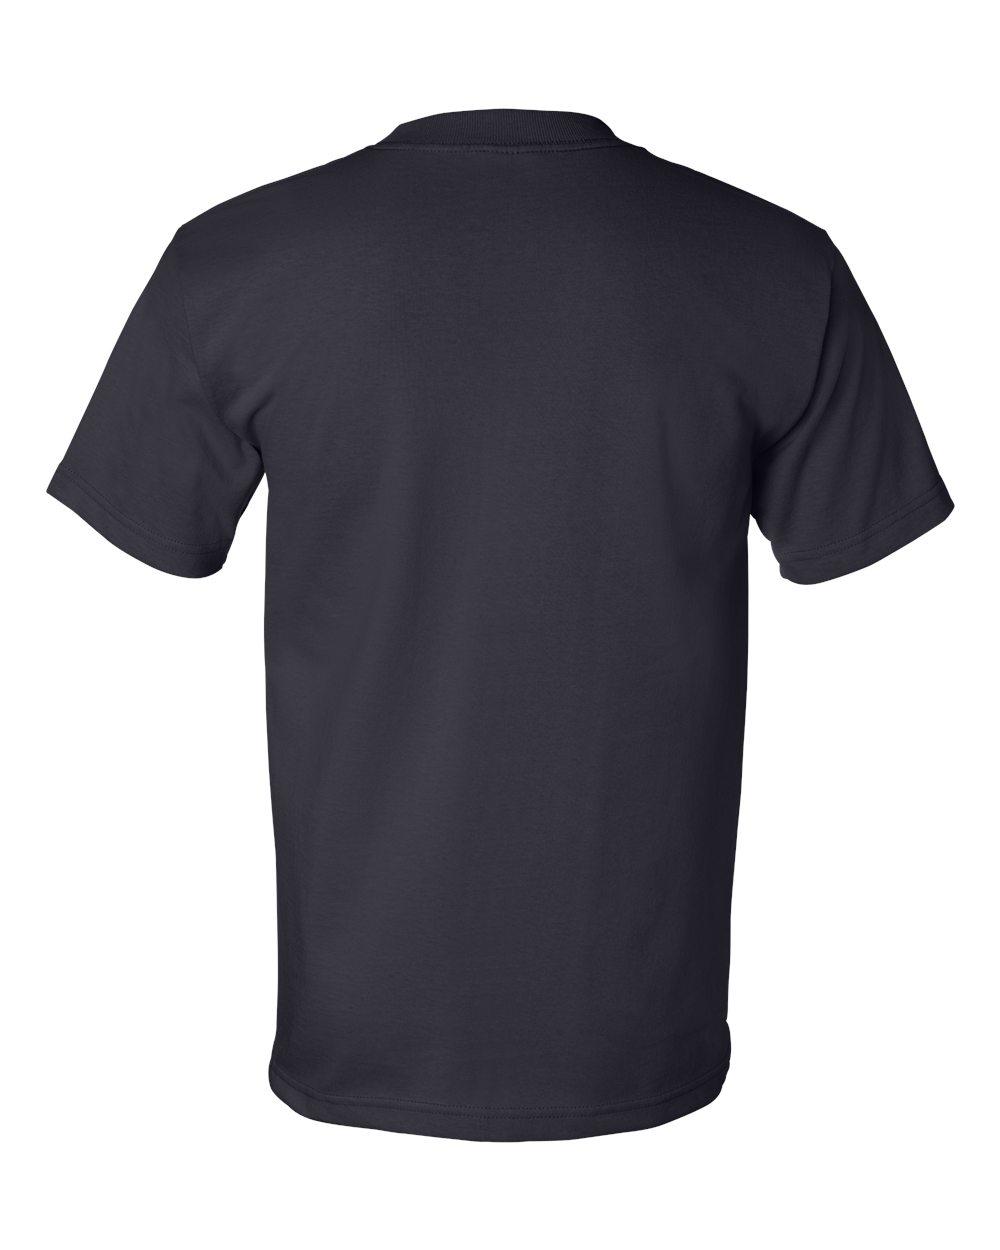 Bayside-Mens-Cotton-Blank-USA-Made-Short-Sleeve-T-Shirt-5100-up-to-5XL thumbnail 28